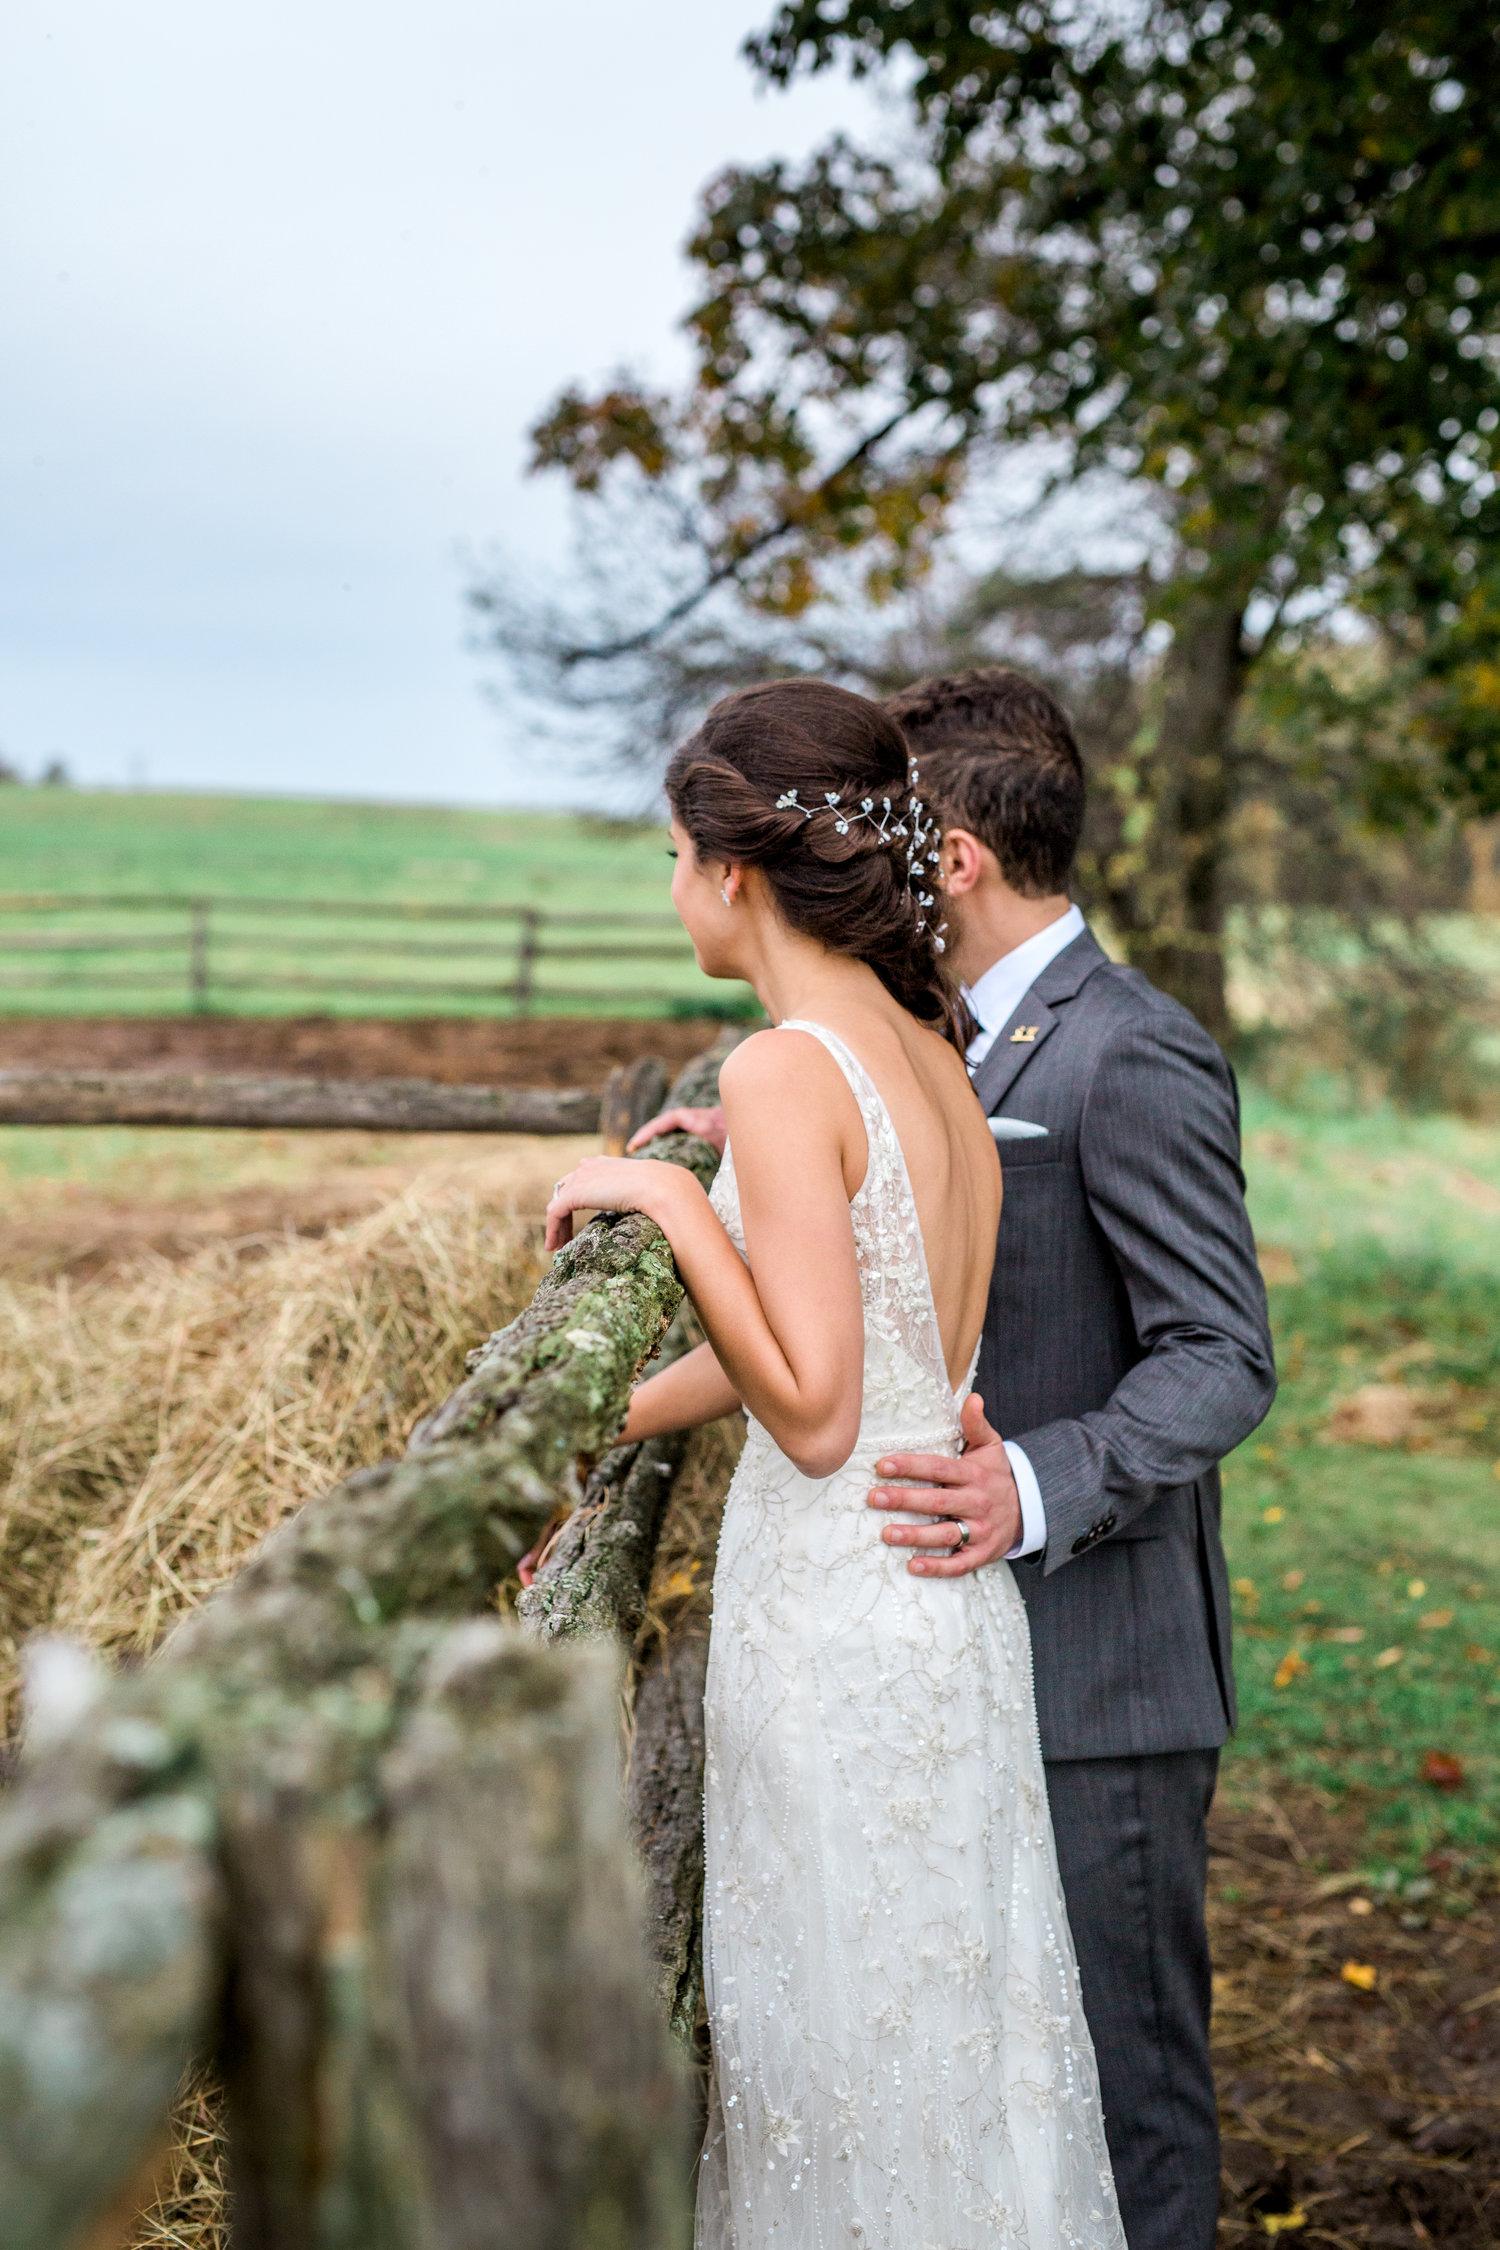 Amir-Golbazi-Danielle-Giroux-Photography_Toronto-Wedding_Cedarwood_Rachel-Paul_477.jpg